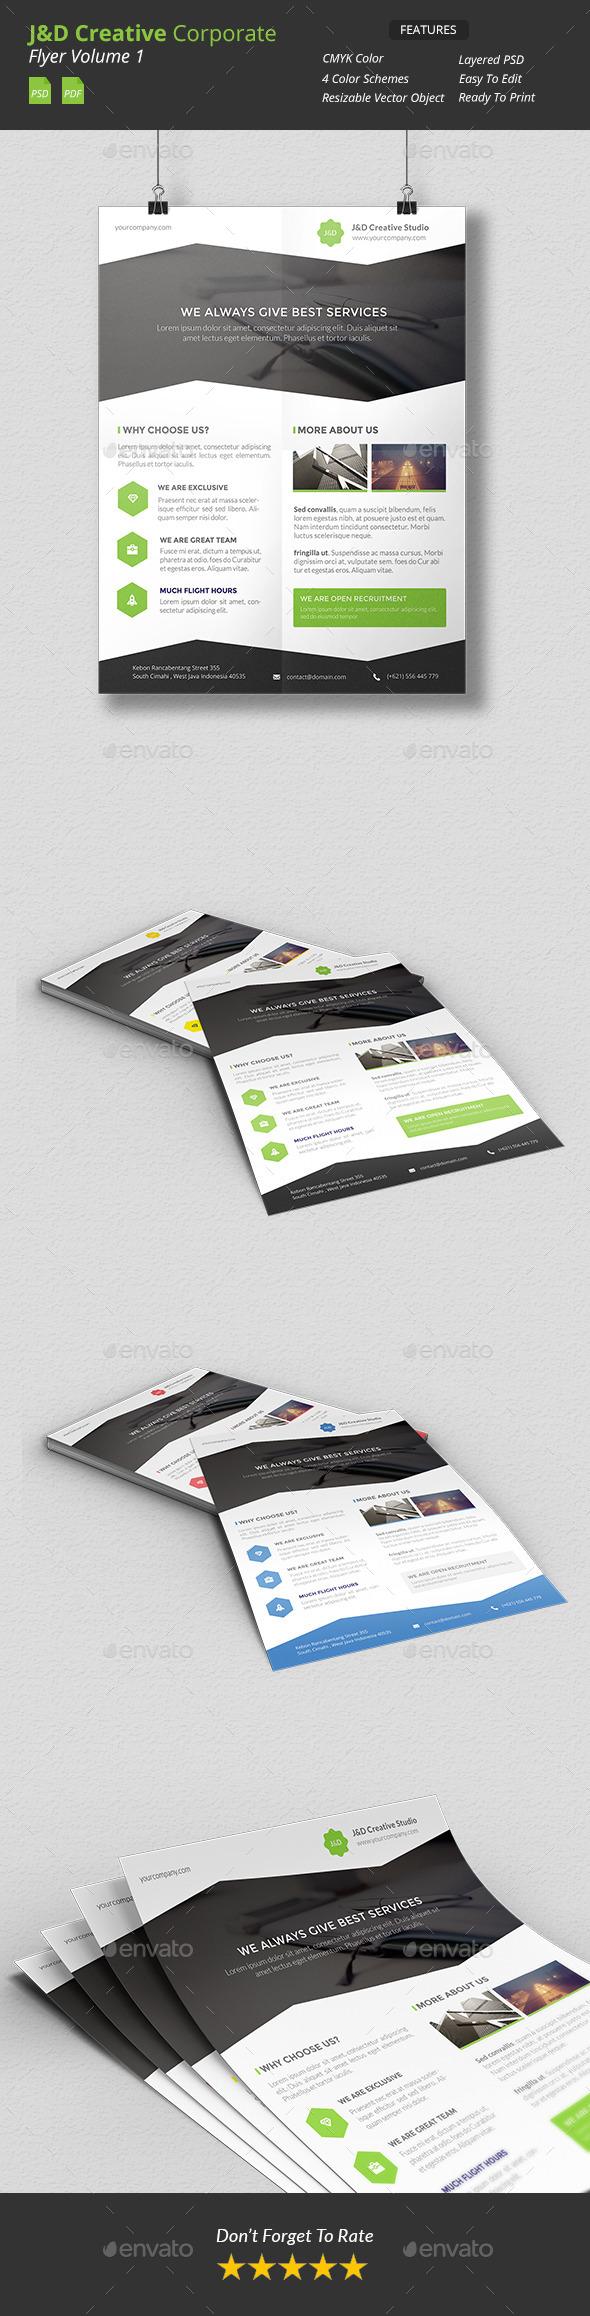 GraphicRiver JnD Creative Corporate Flyer 11405874